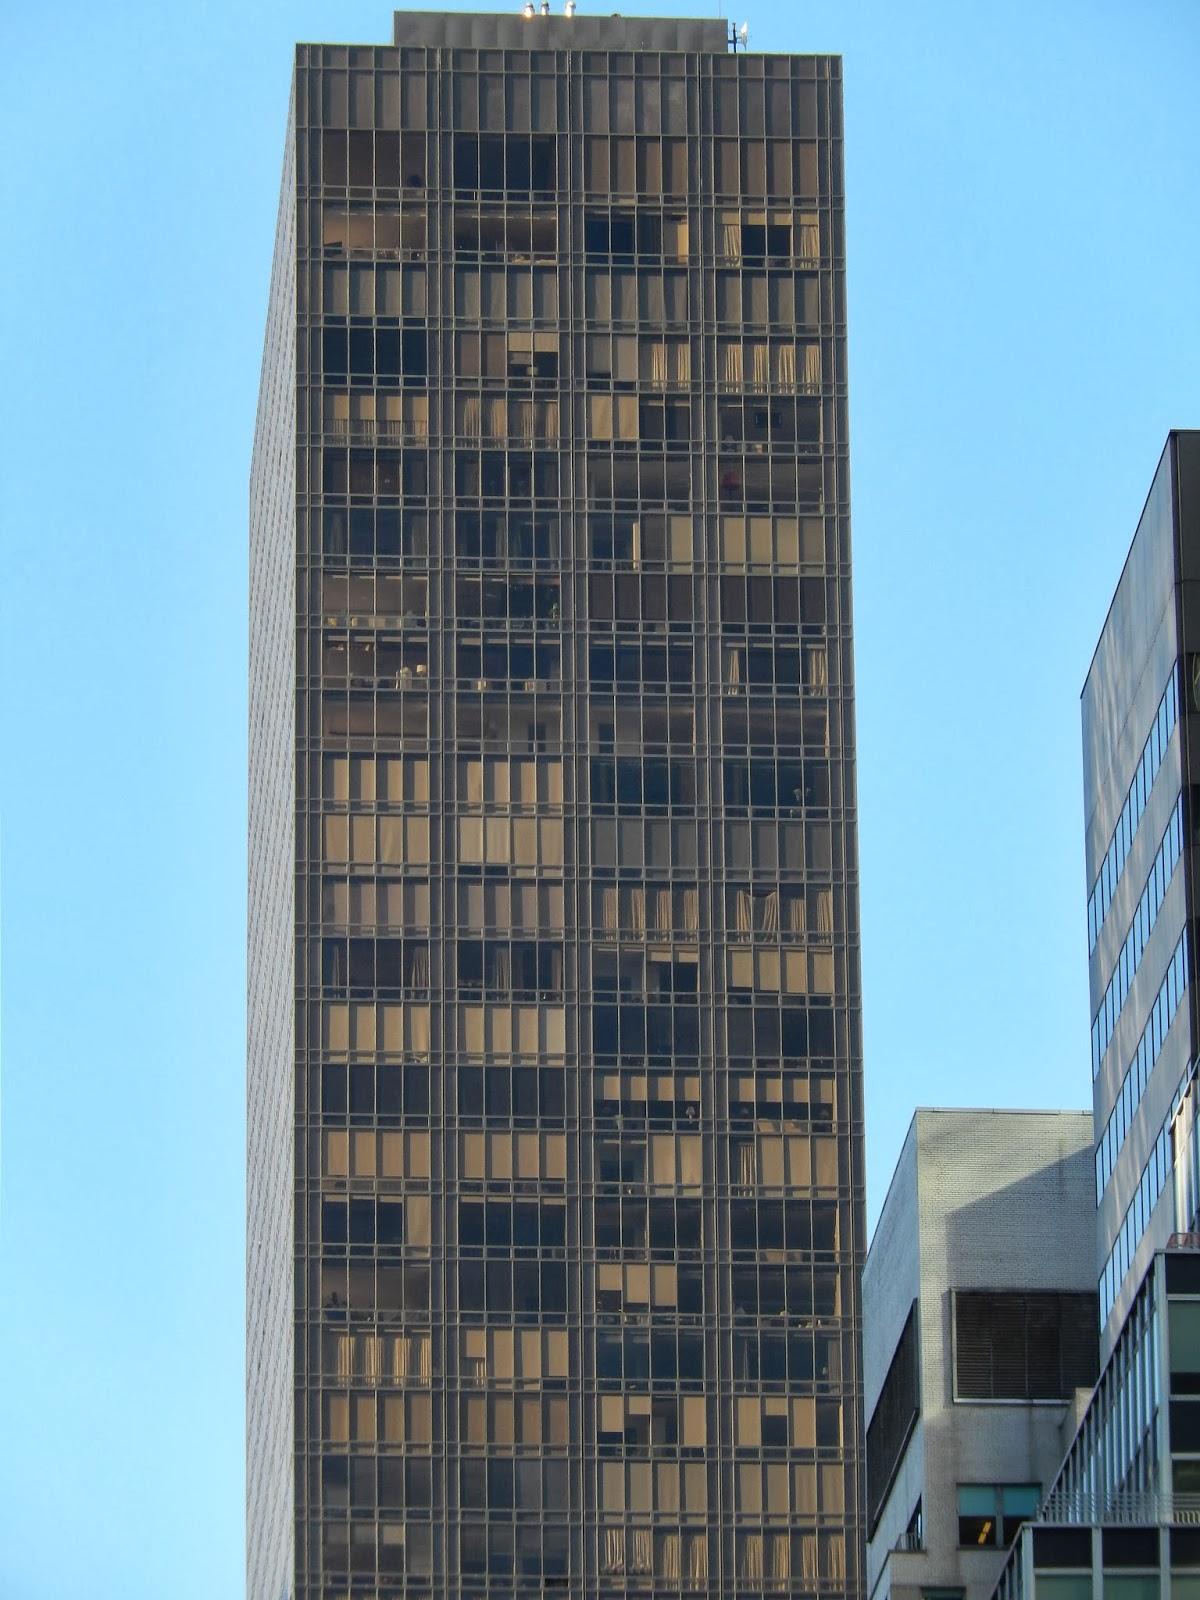 Bigappleannex Com Nyc Photoblog Olympic Tower Fifth Avenue